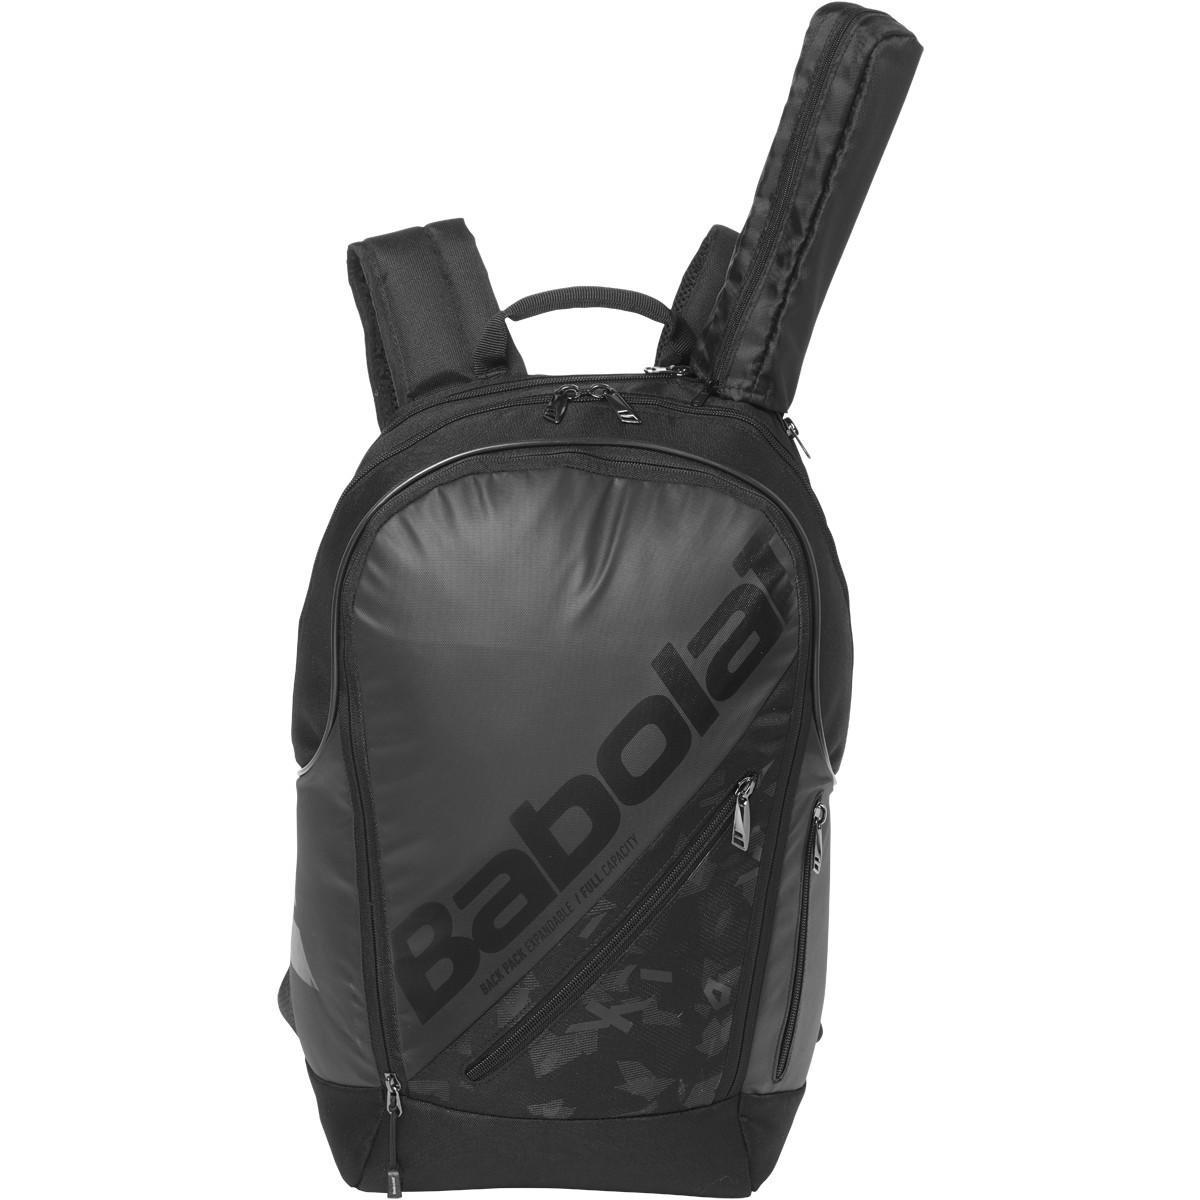 Теннисный рюкзак Babolat Team Line Backpack Expandable black